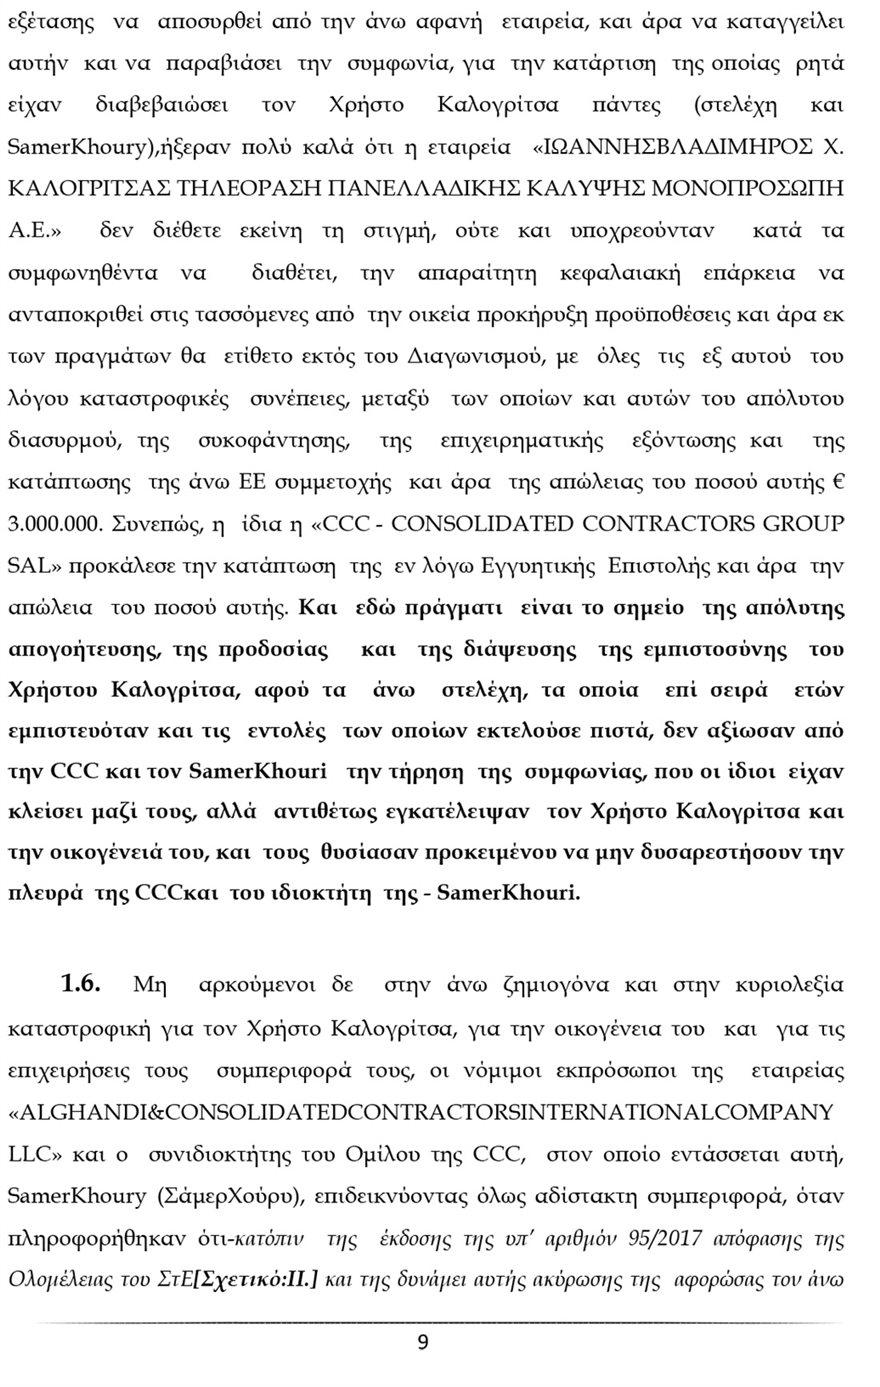 ypomnima-9